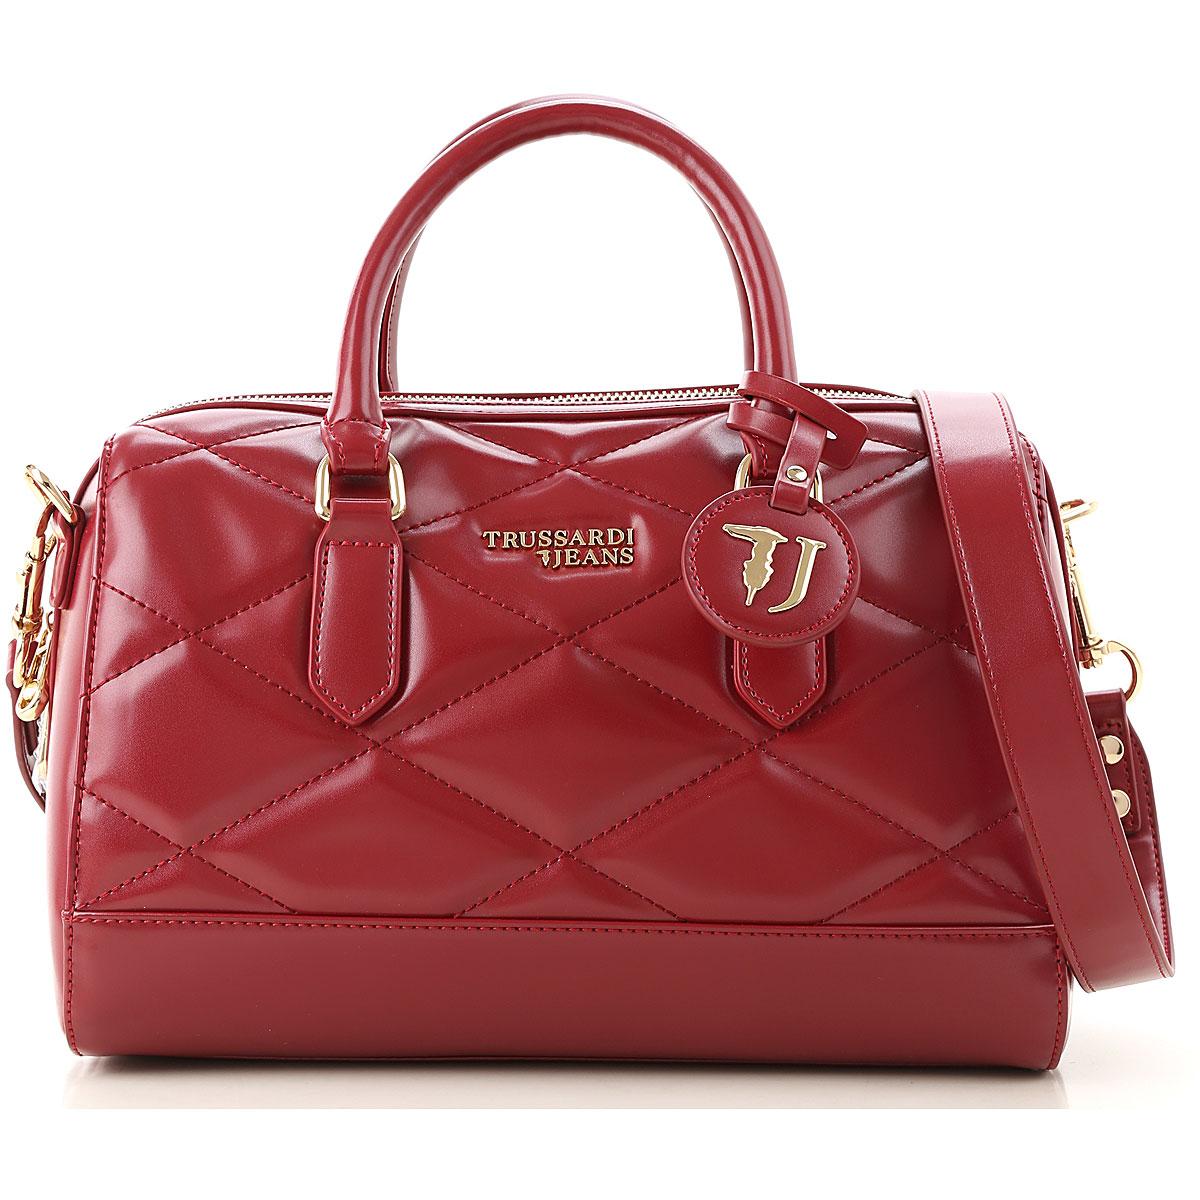 Trussardi Top Handle Handbag On Sale, Garnet, Eco Leather, 2019